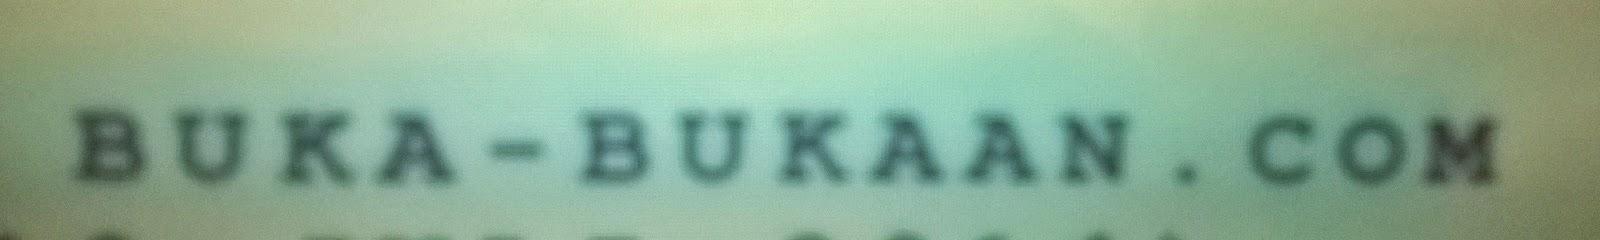 Buka-bukaan.com